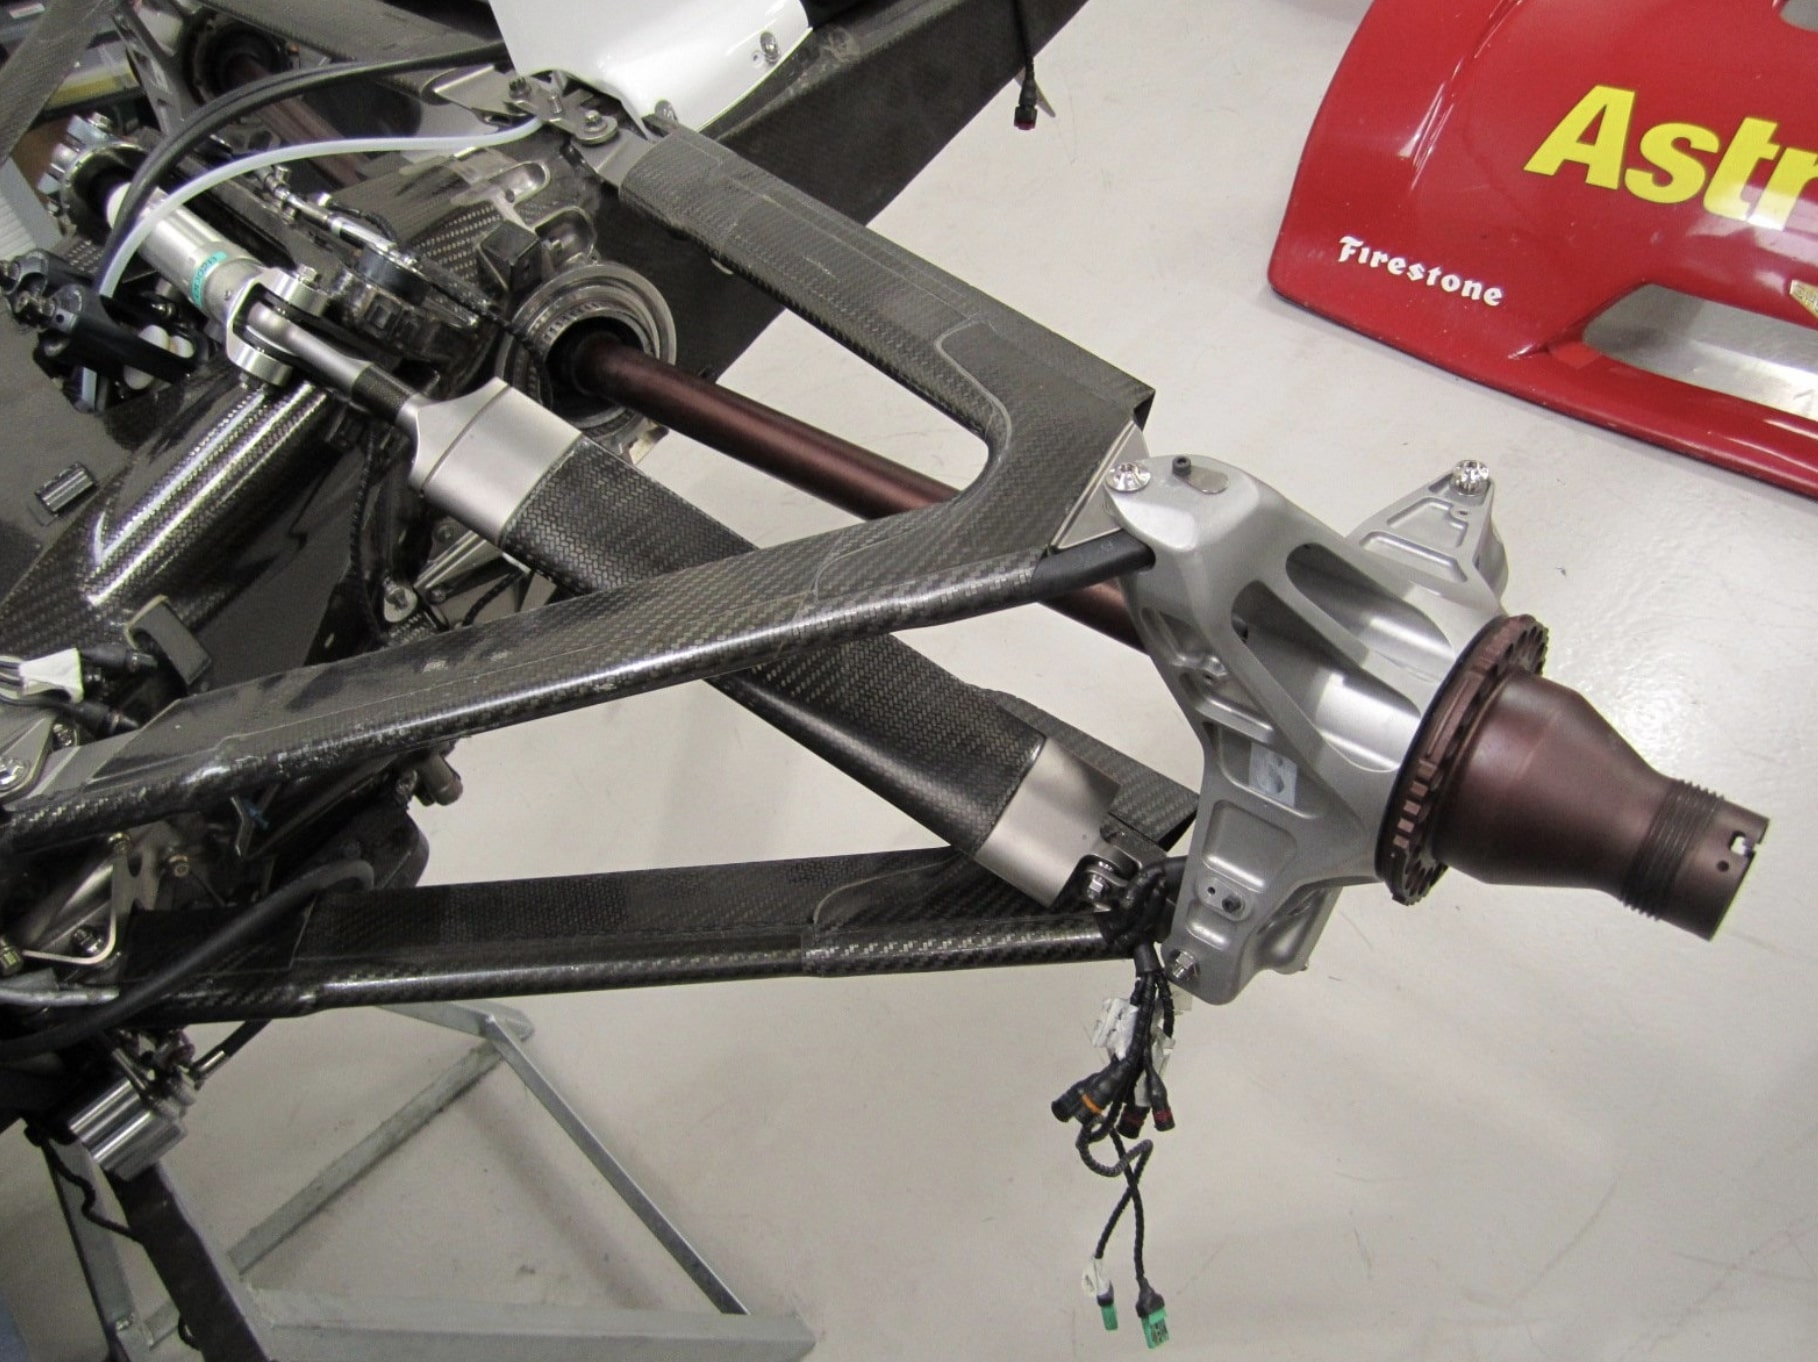 BAR-Honda Bonneville (3)